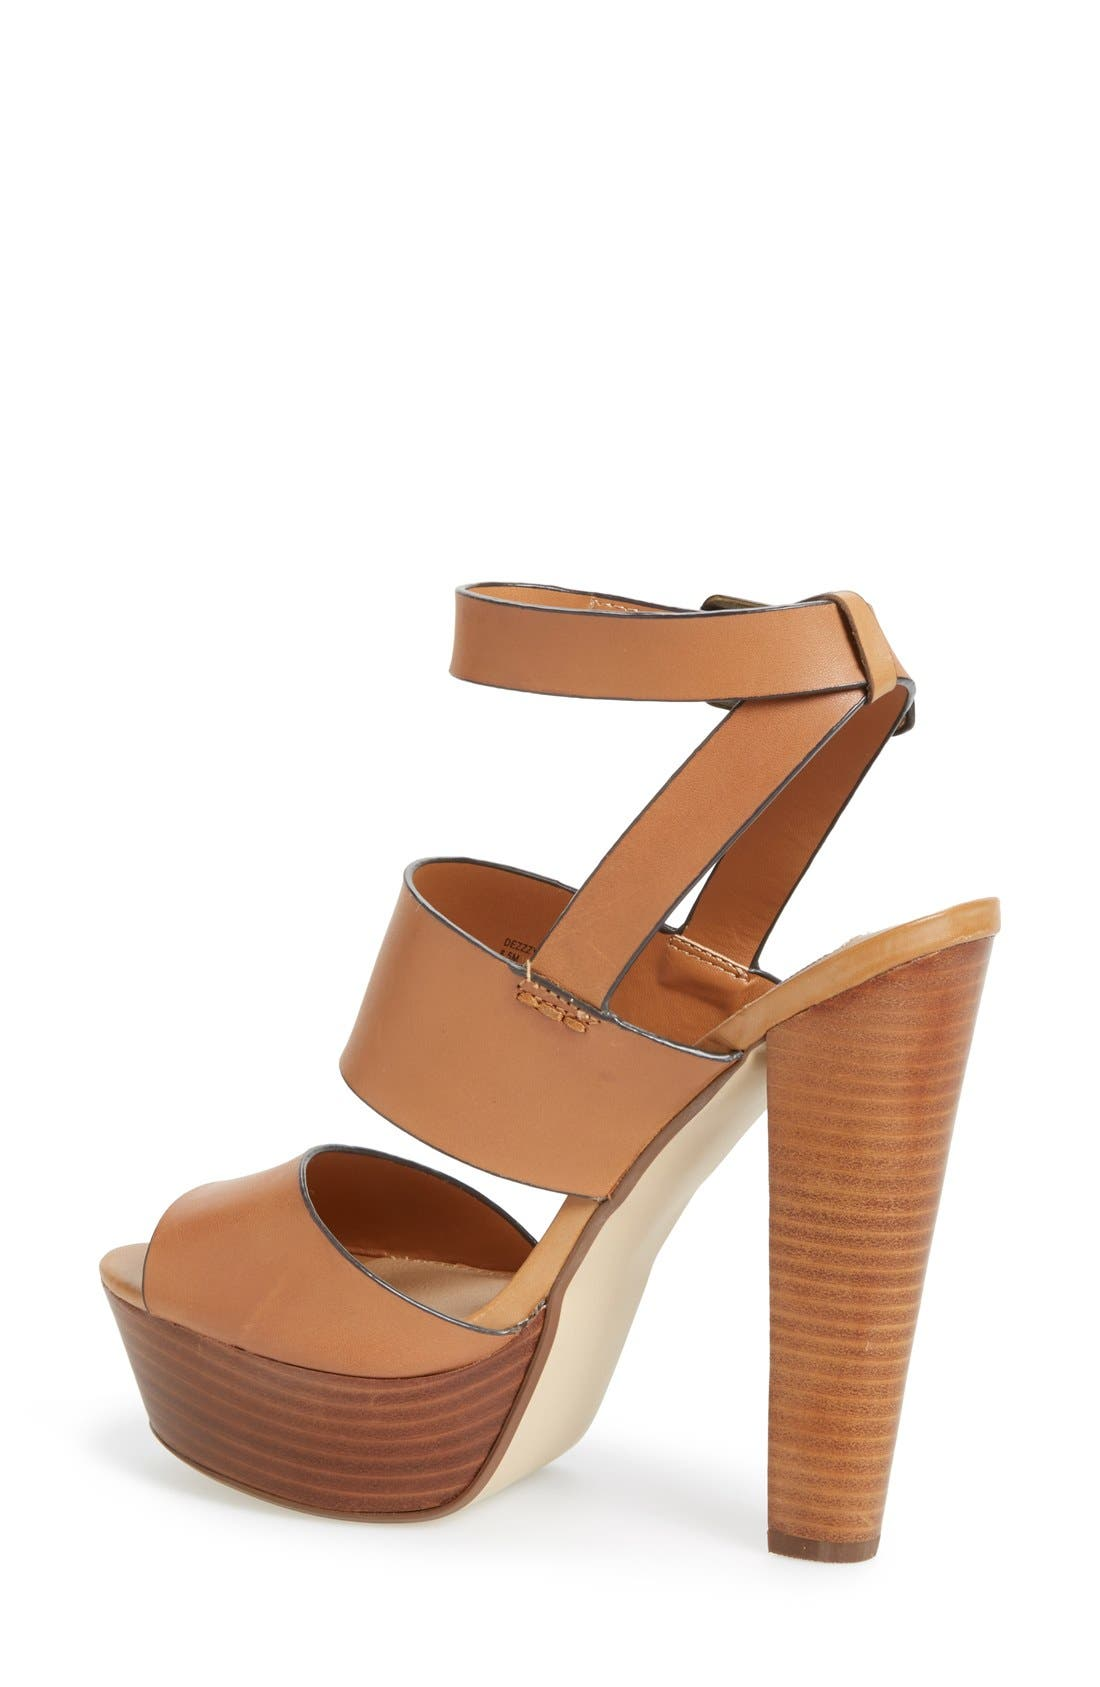 Alternate Image 2  - Steve Madden 'Dezzzy' Leather Ankle Strap Sandal (Women)